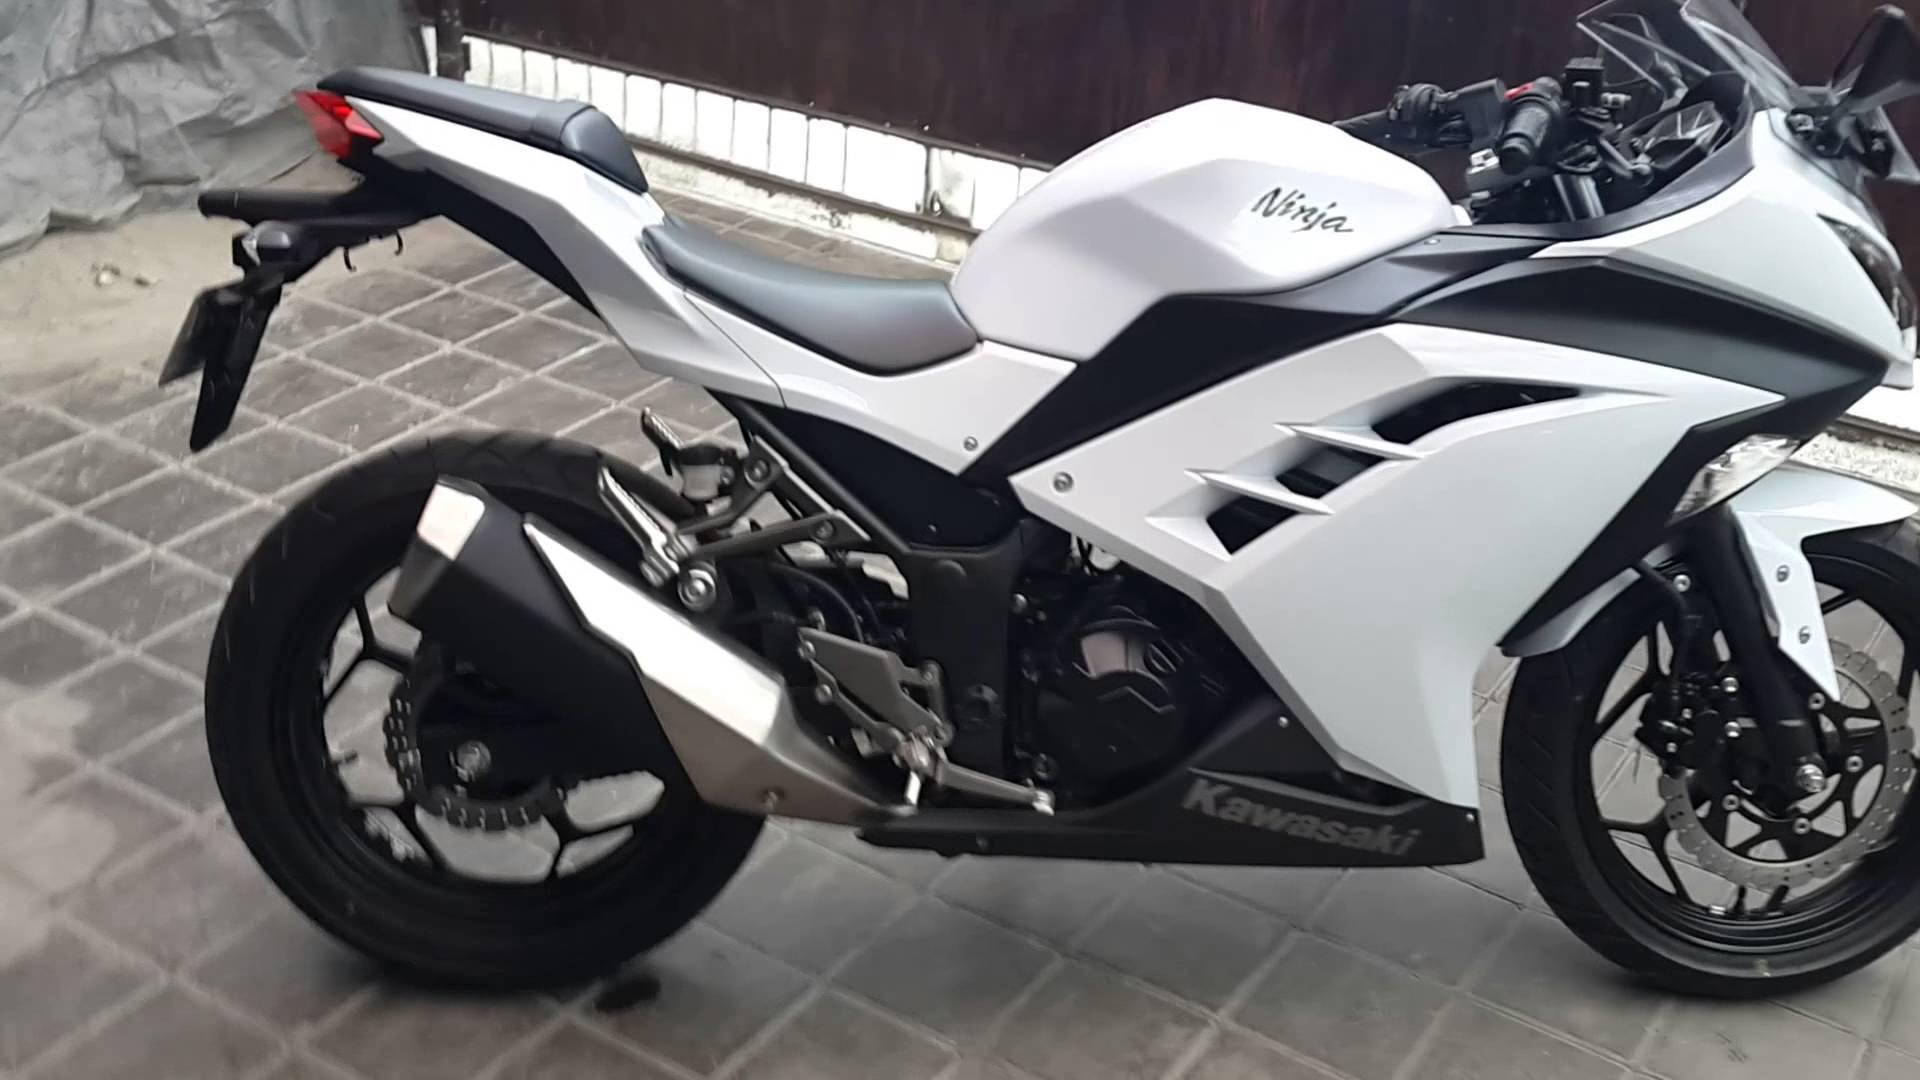 Ninja 250 White >> 2016 Kawasaki Ninja 250r Wallpapers - Wallpaper Cave